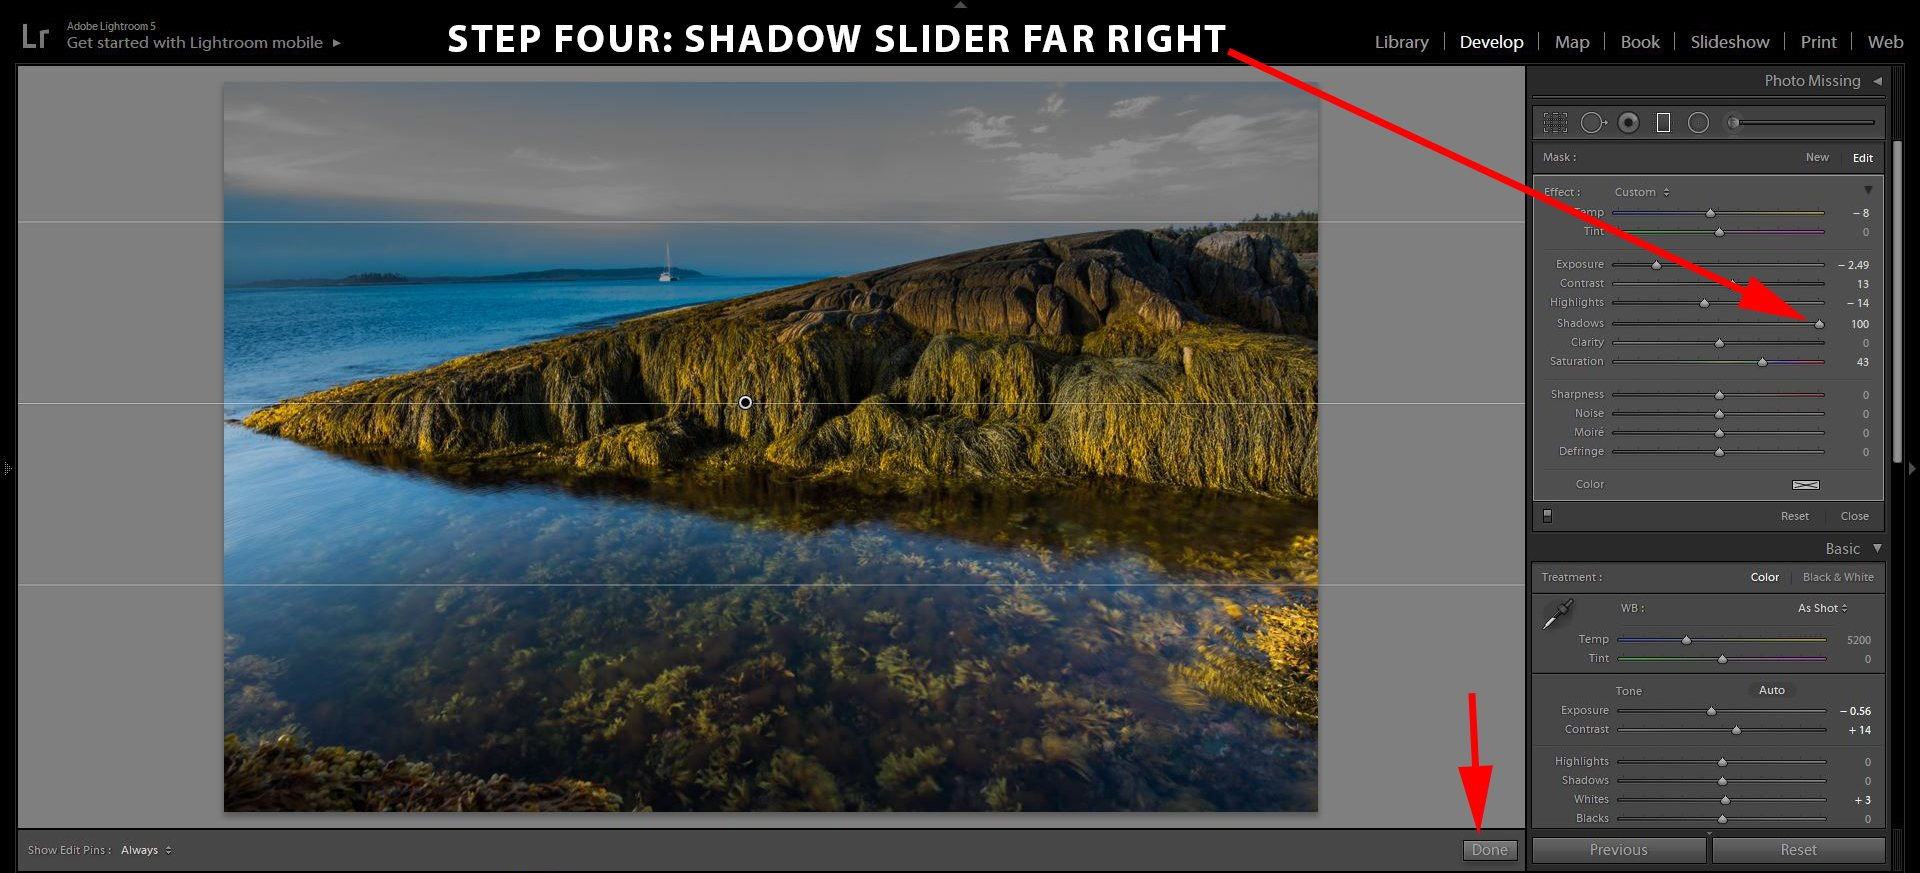 4 Shadow Slider Right Better Skies in LIghtroom